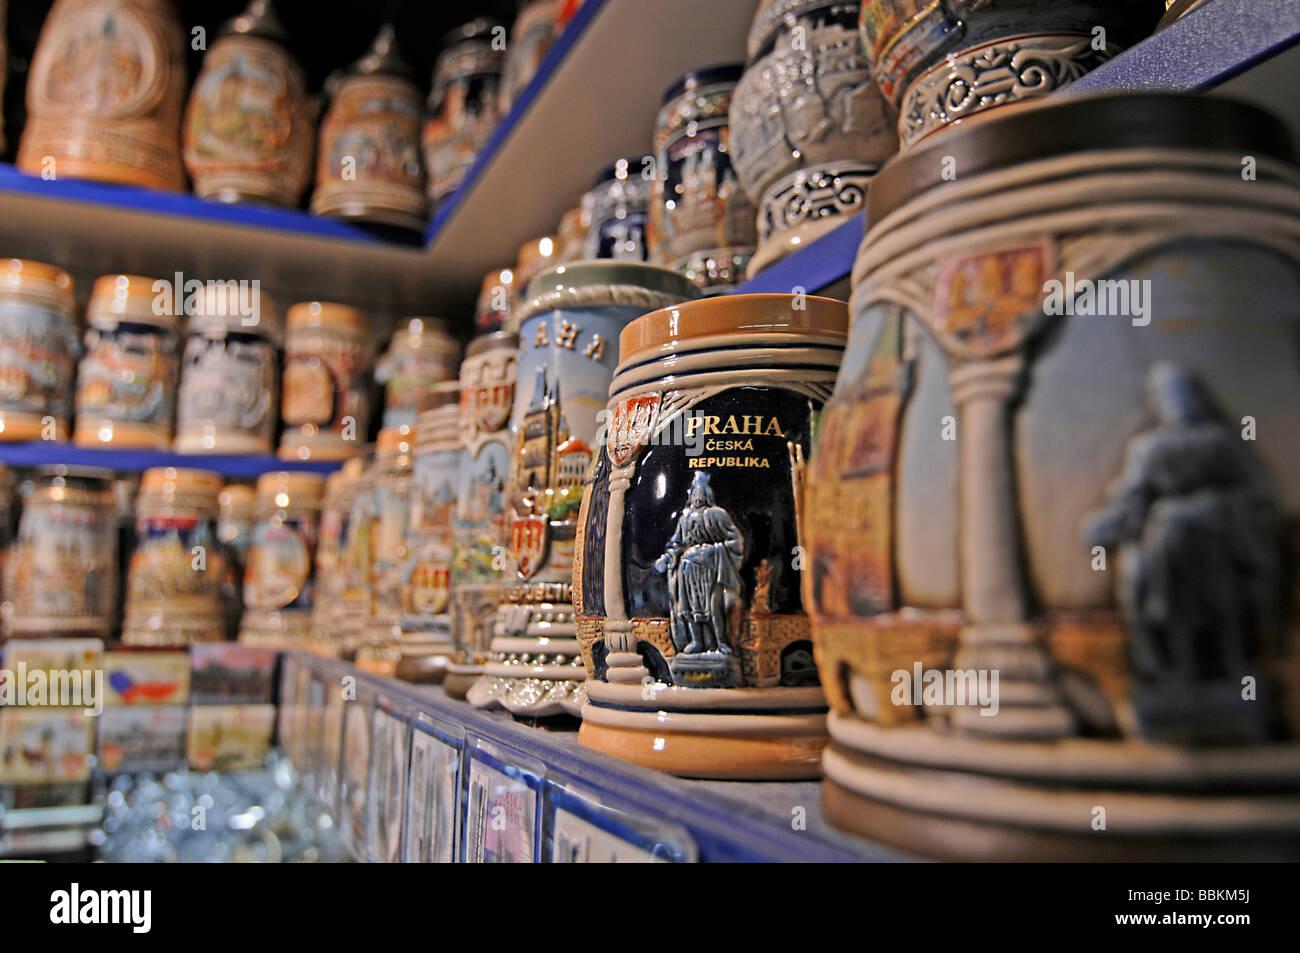 Souvenir shop in a passage on Vltava River, Prague, Czech Republic, Europe Stock Photo